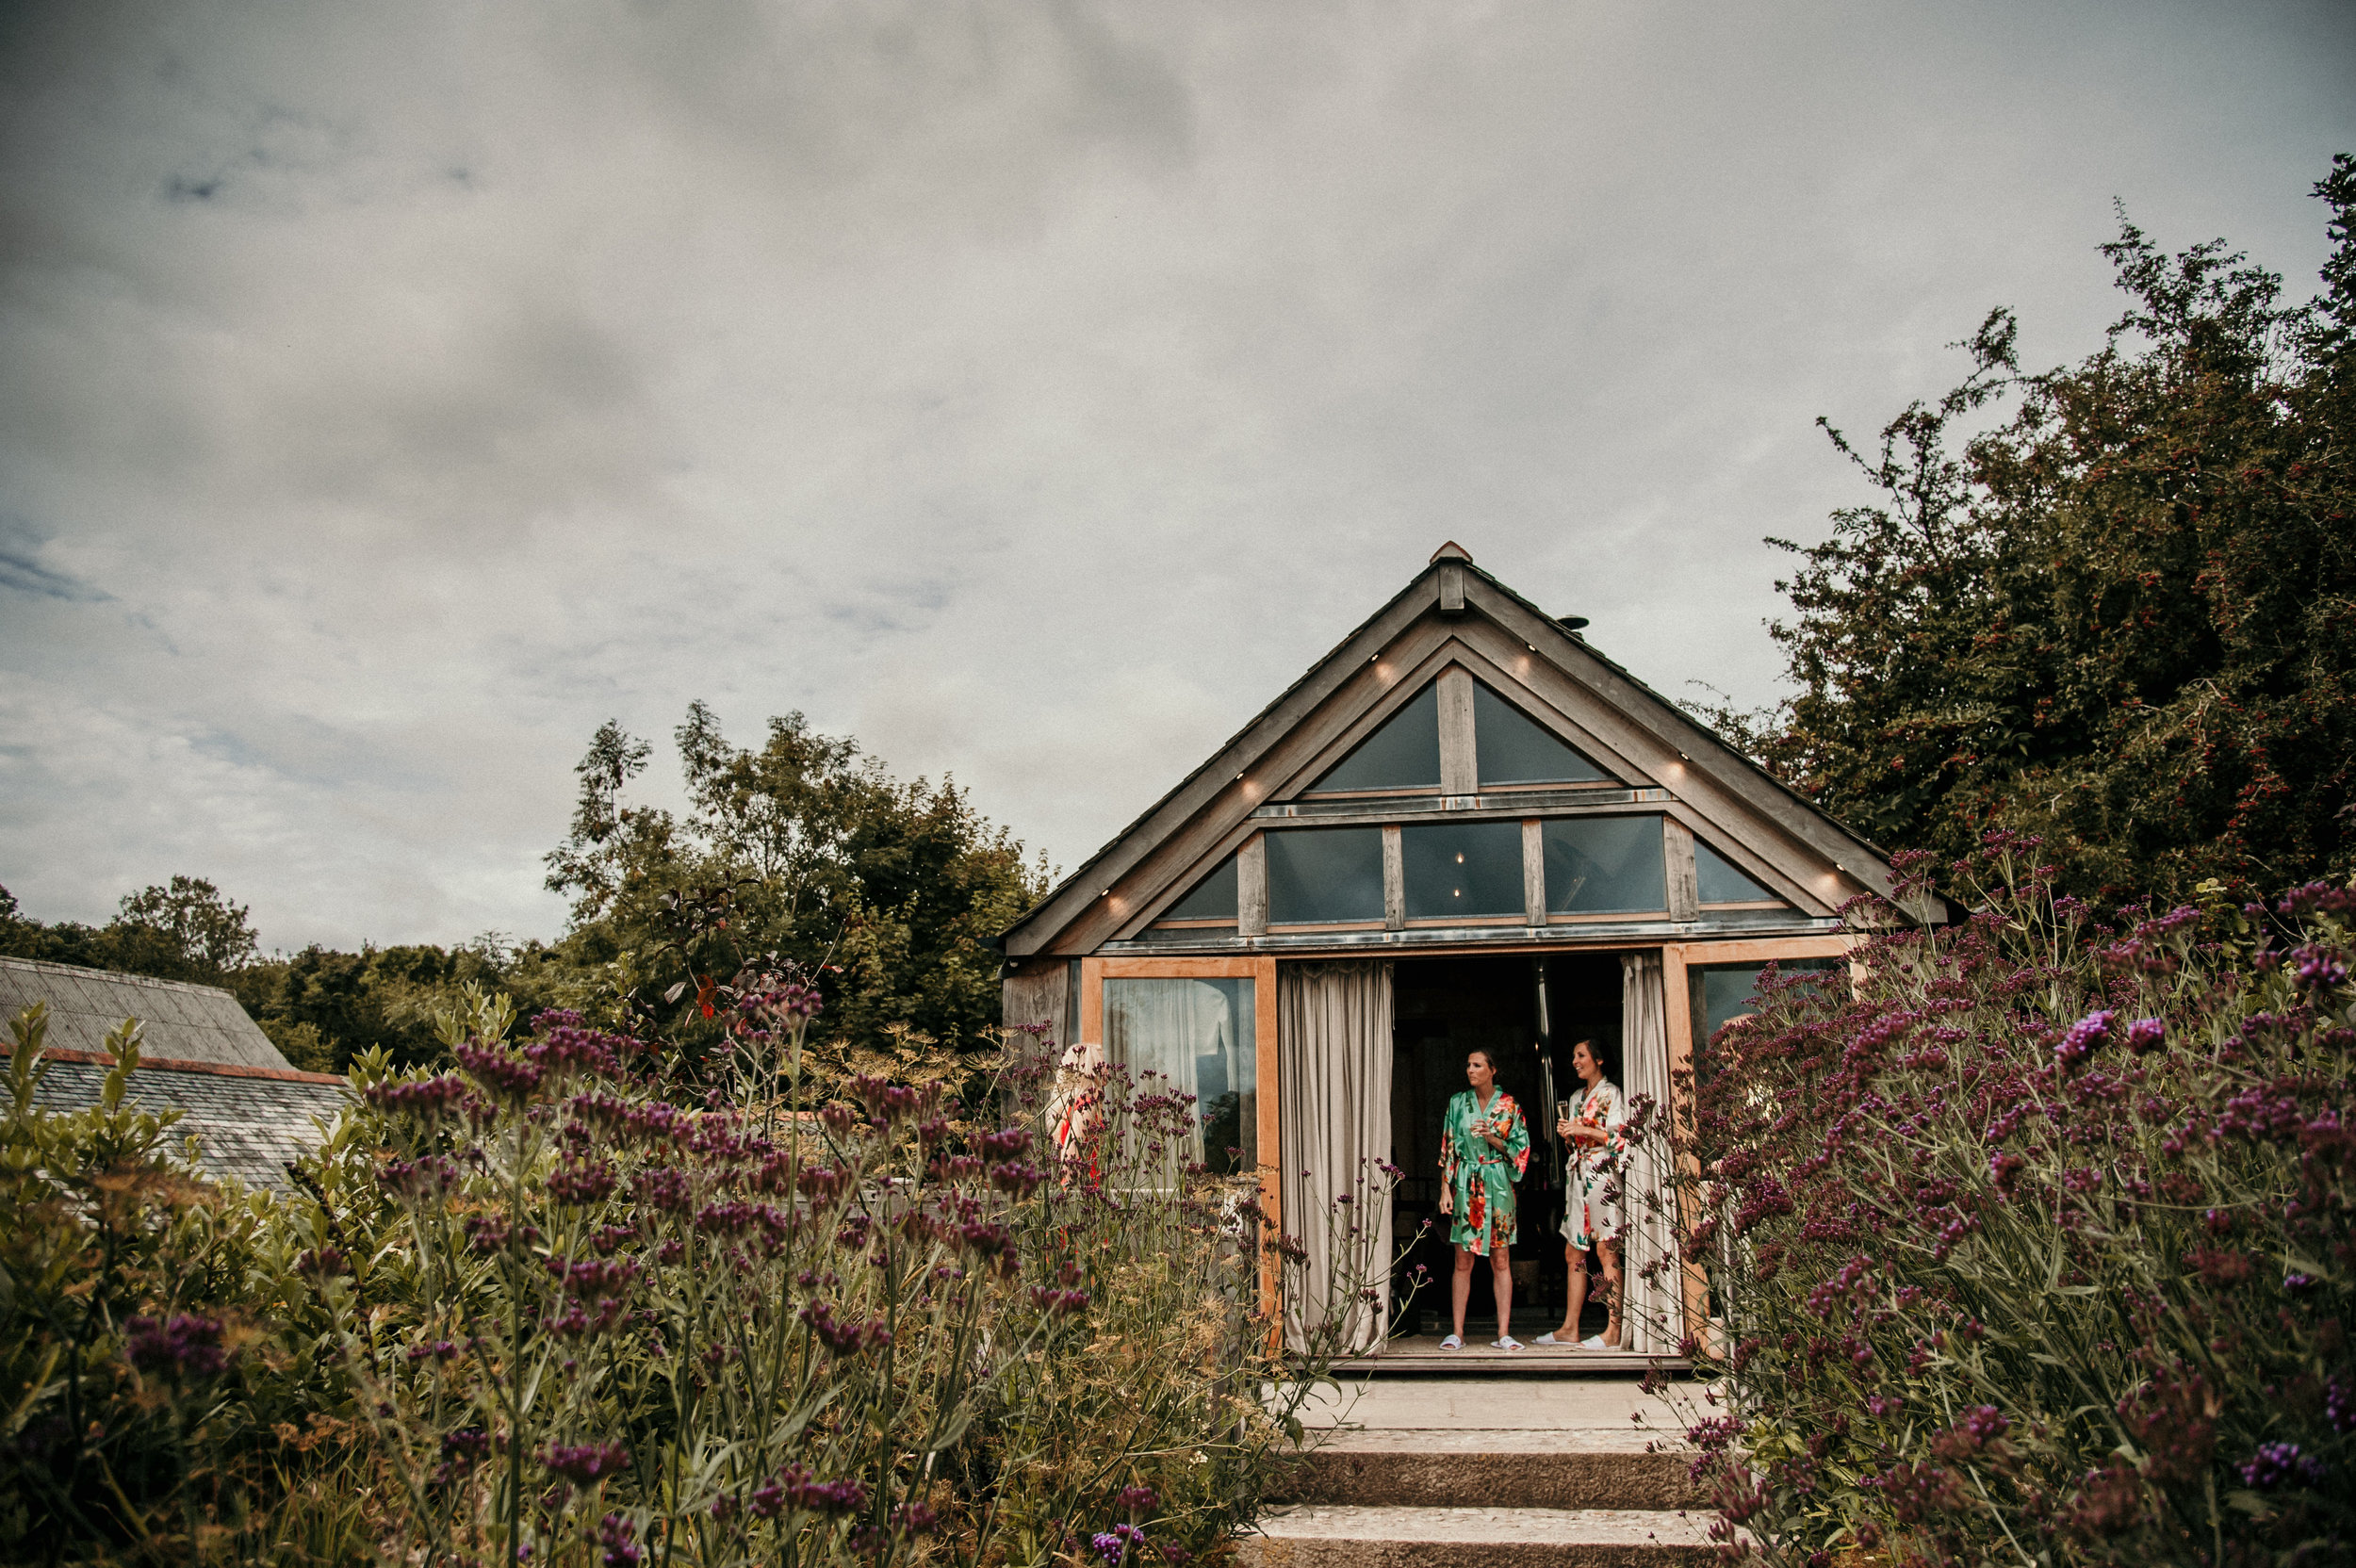 nancarrow-farm-wedding-photographer-22.jpg